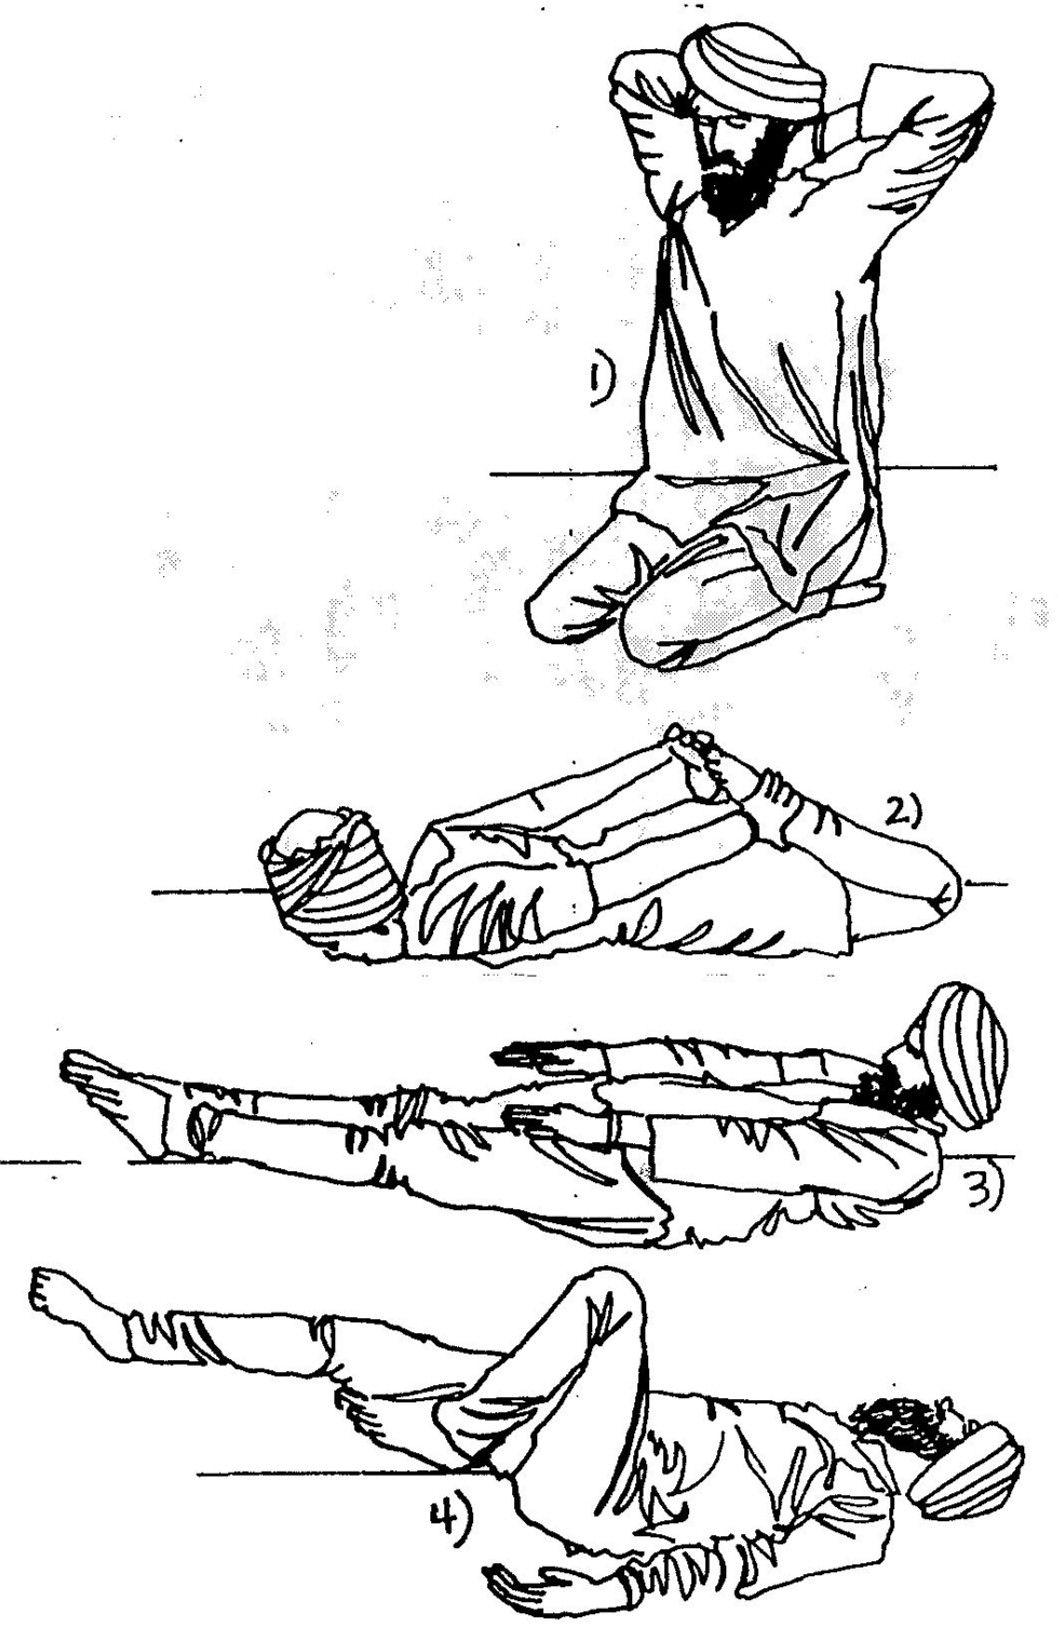 Kundalini Yoga for abdominal strengthening | Kundalini ... | 1063 x 1637 jpeg 182kB